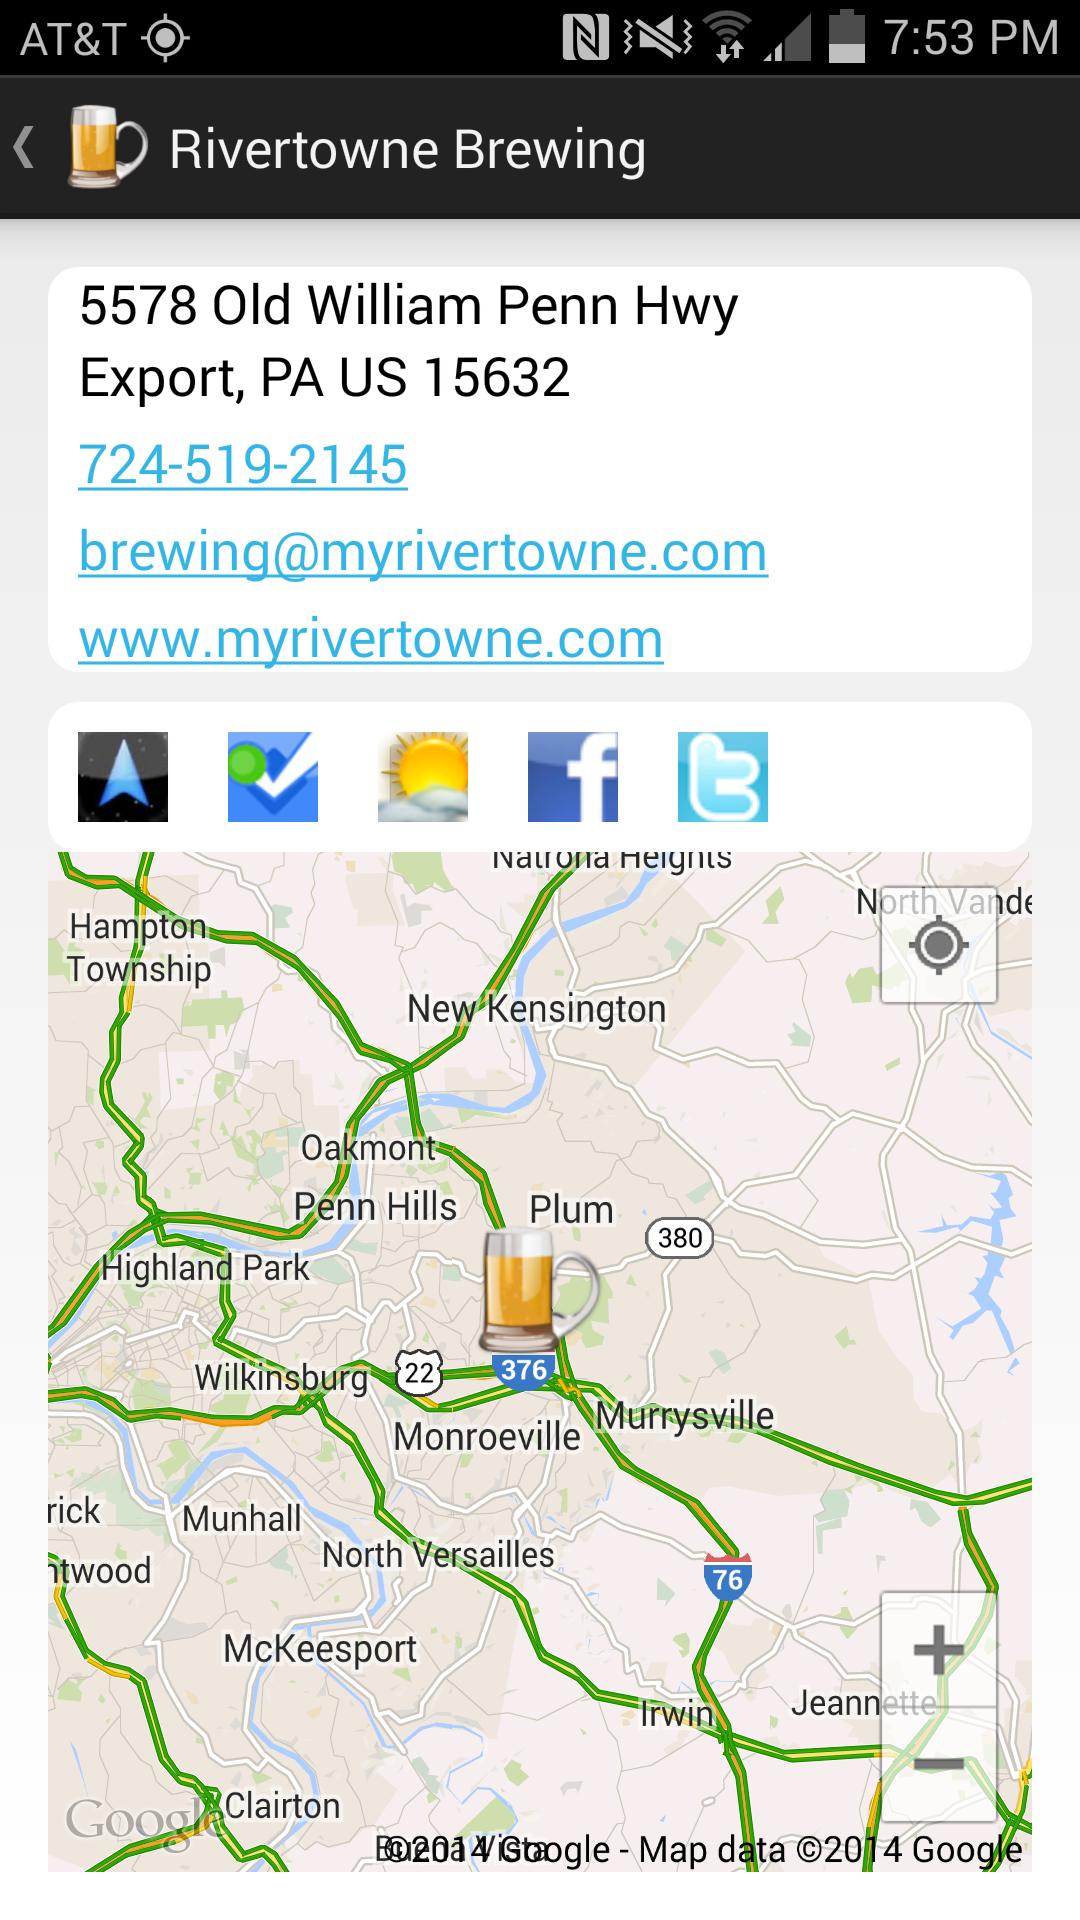 Rivertowne brewing export pa compassbrewingcraftmobilepshtml